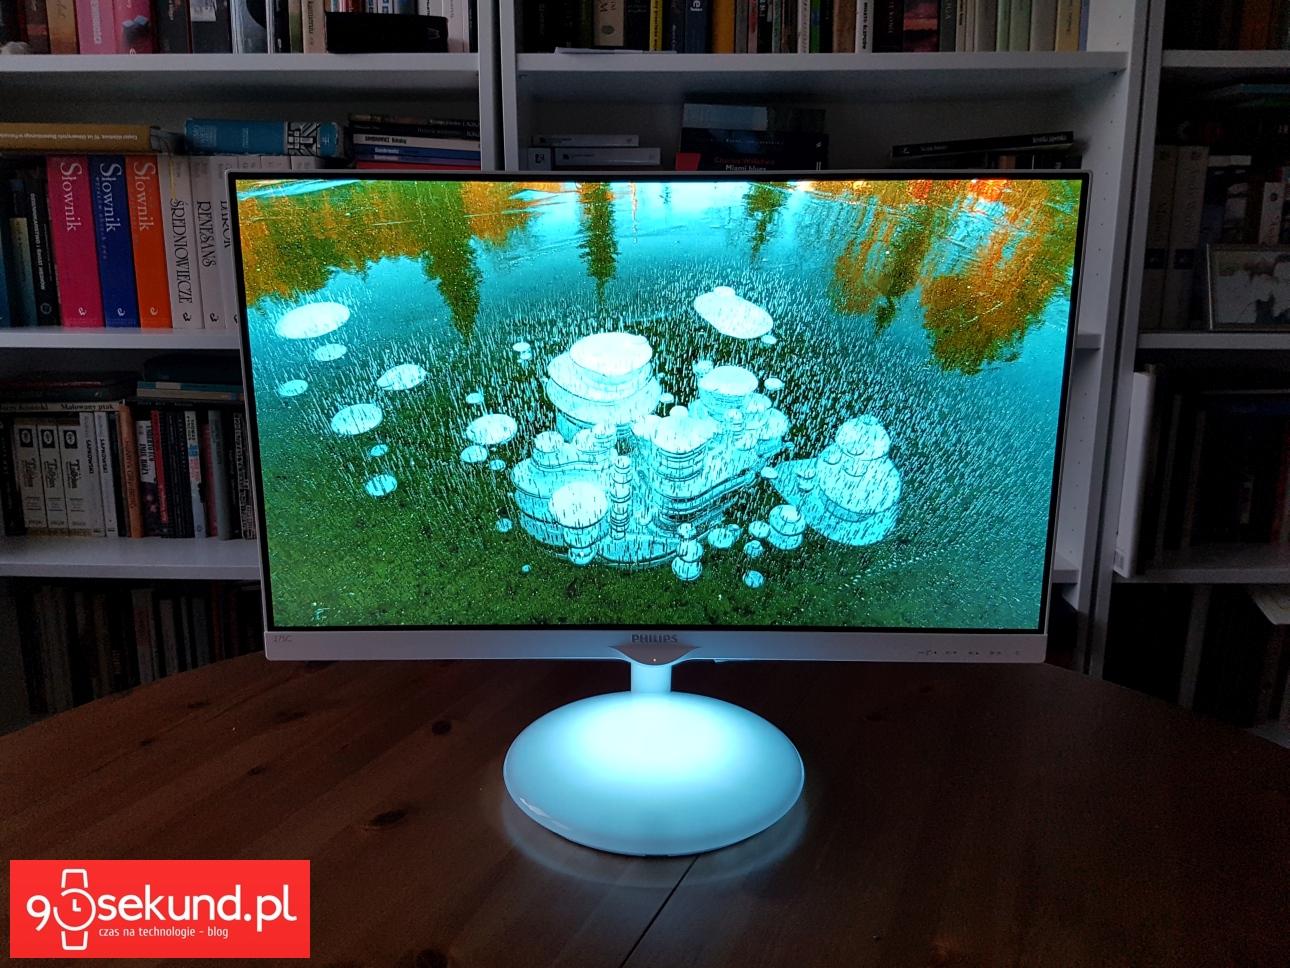 Monitor Philips Moda 275C Ambiglow Plus - recenzja 90sekund.pl